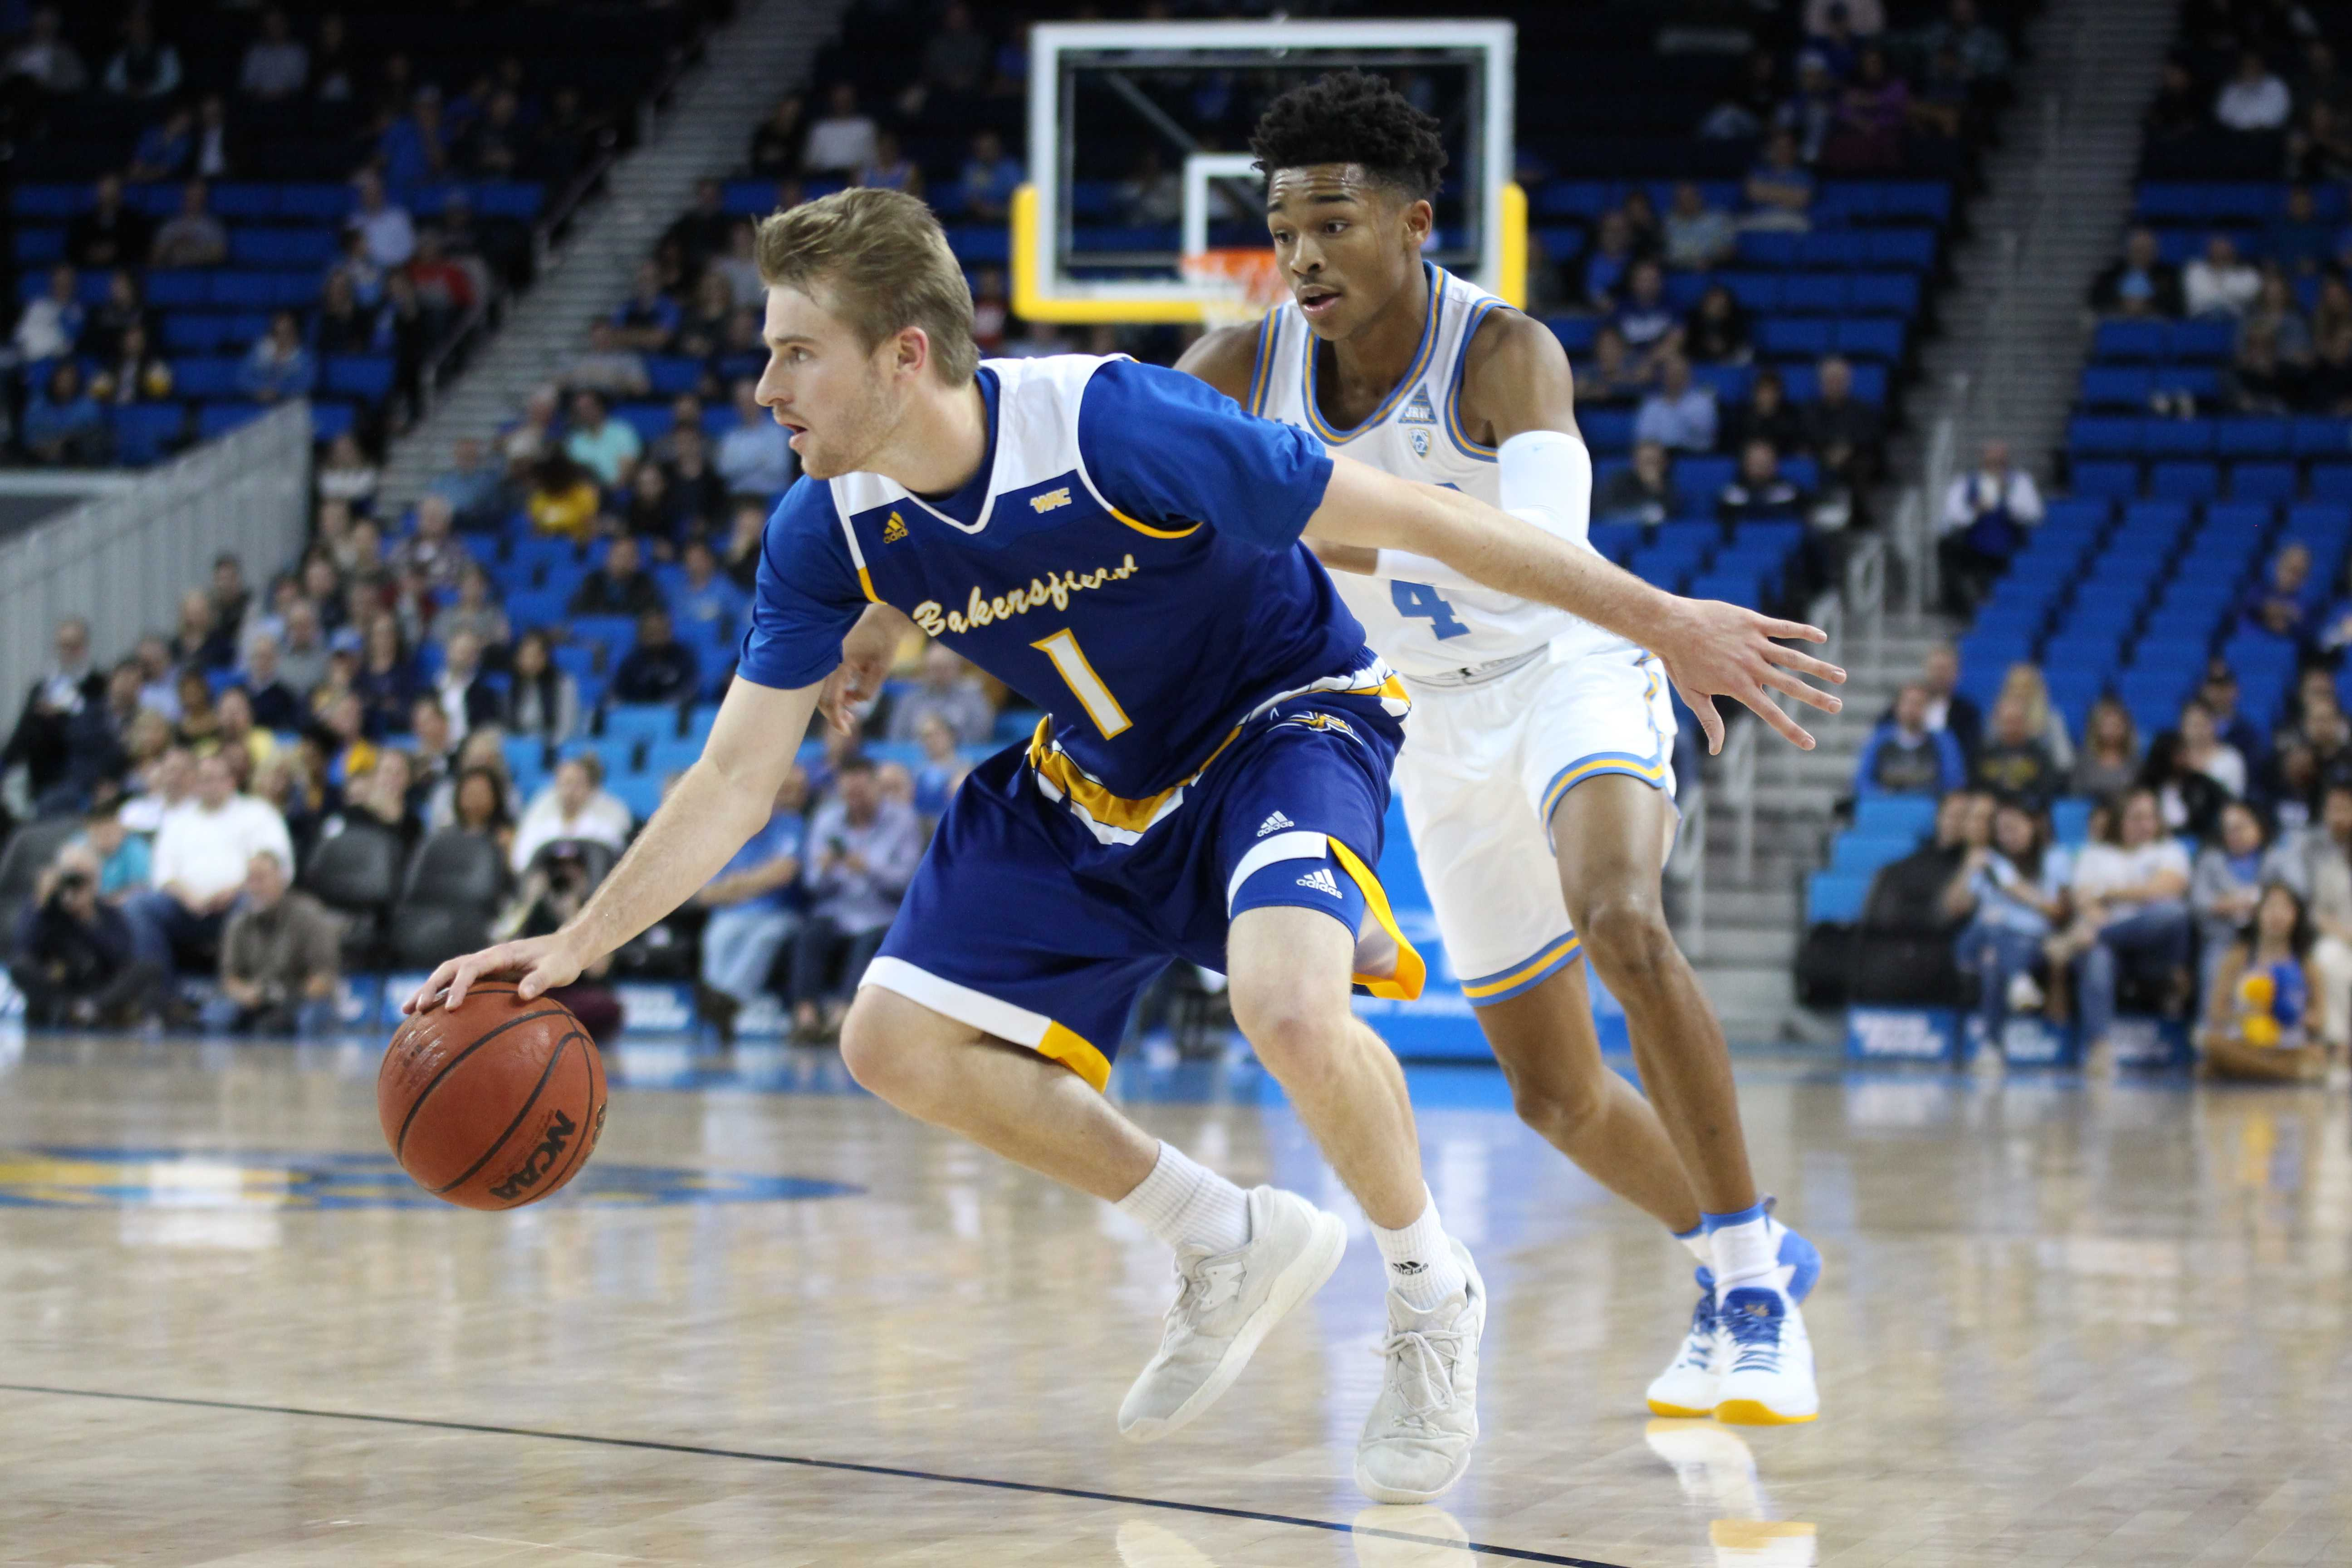 Roadrunners fall short in upset bid at UCLA